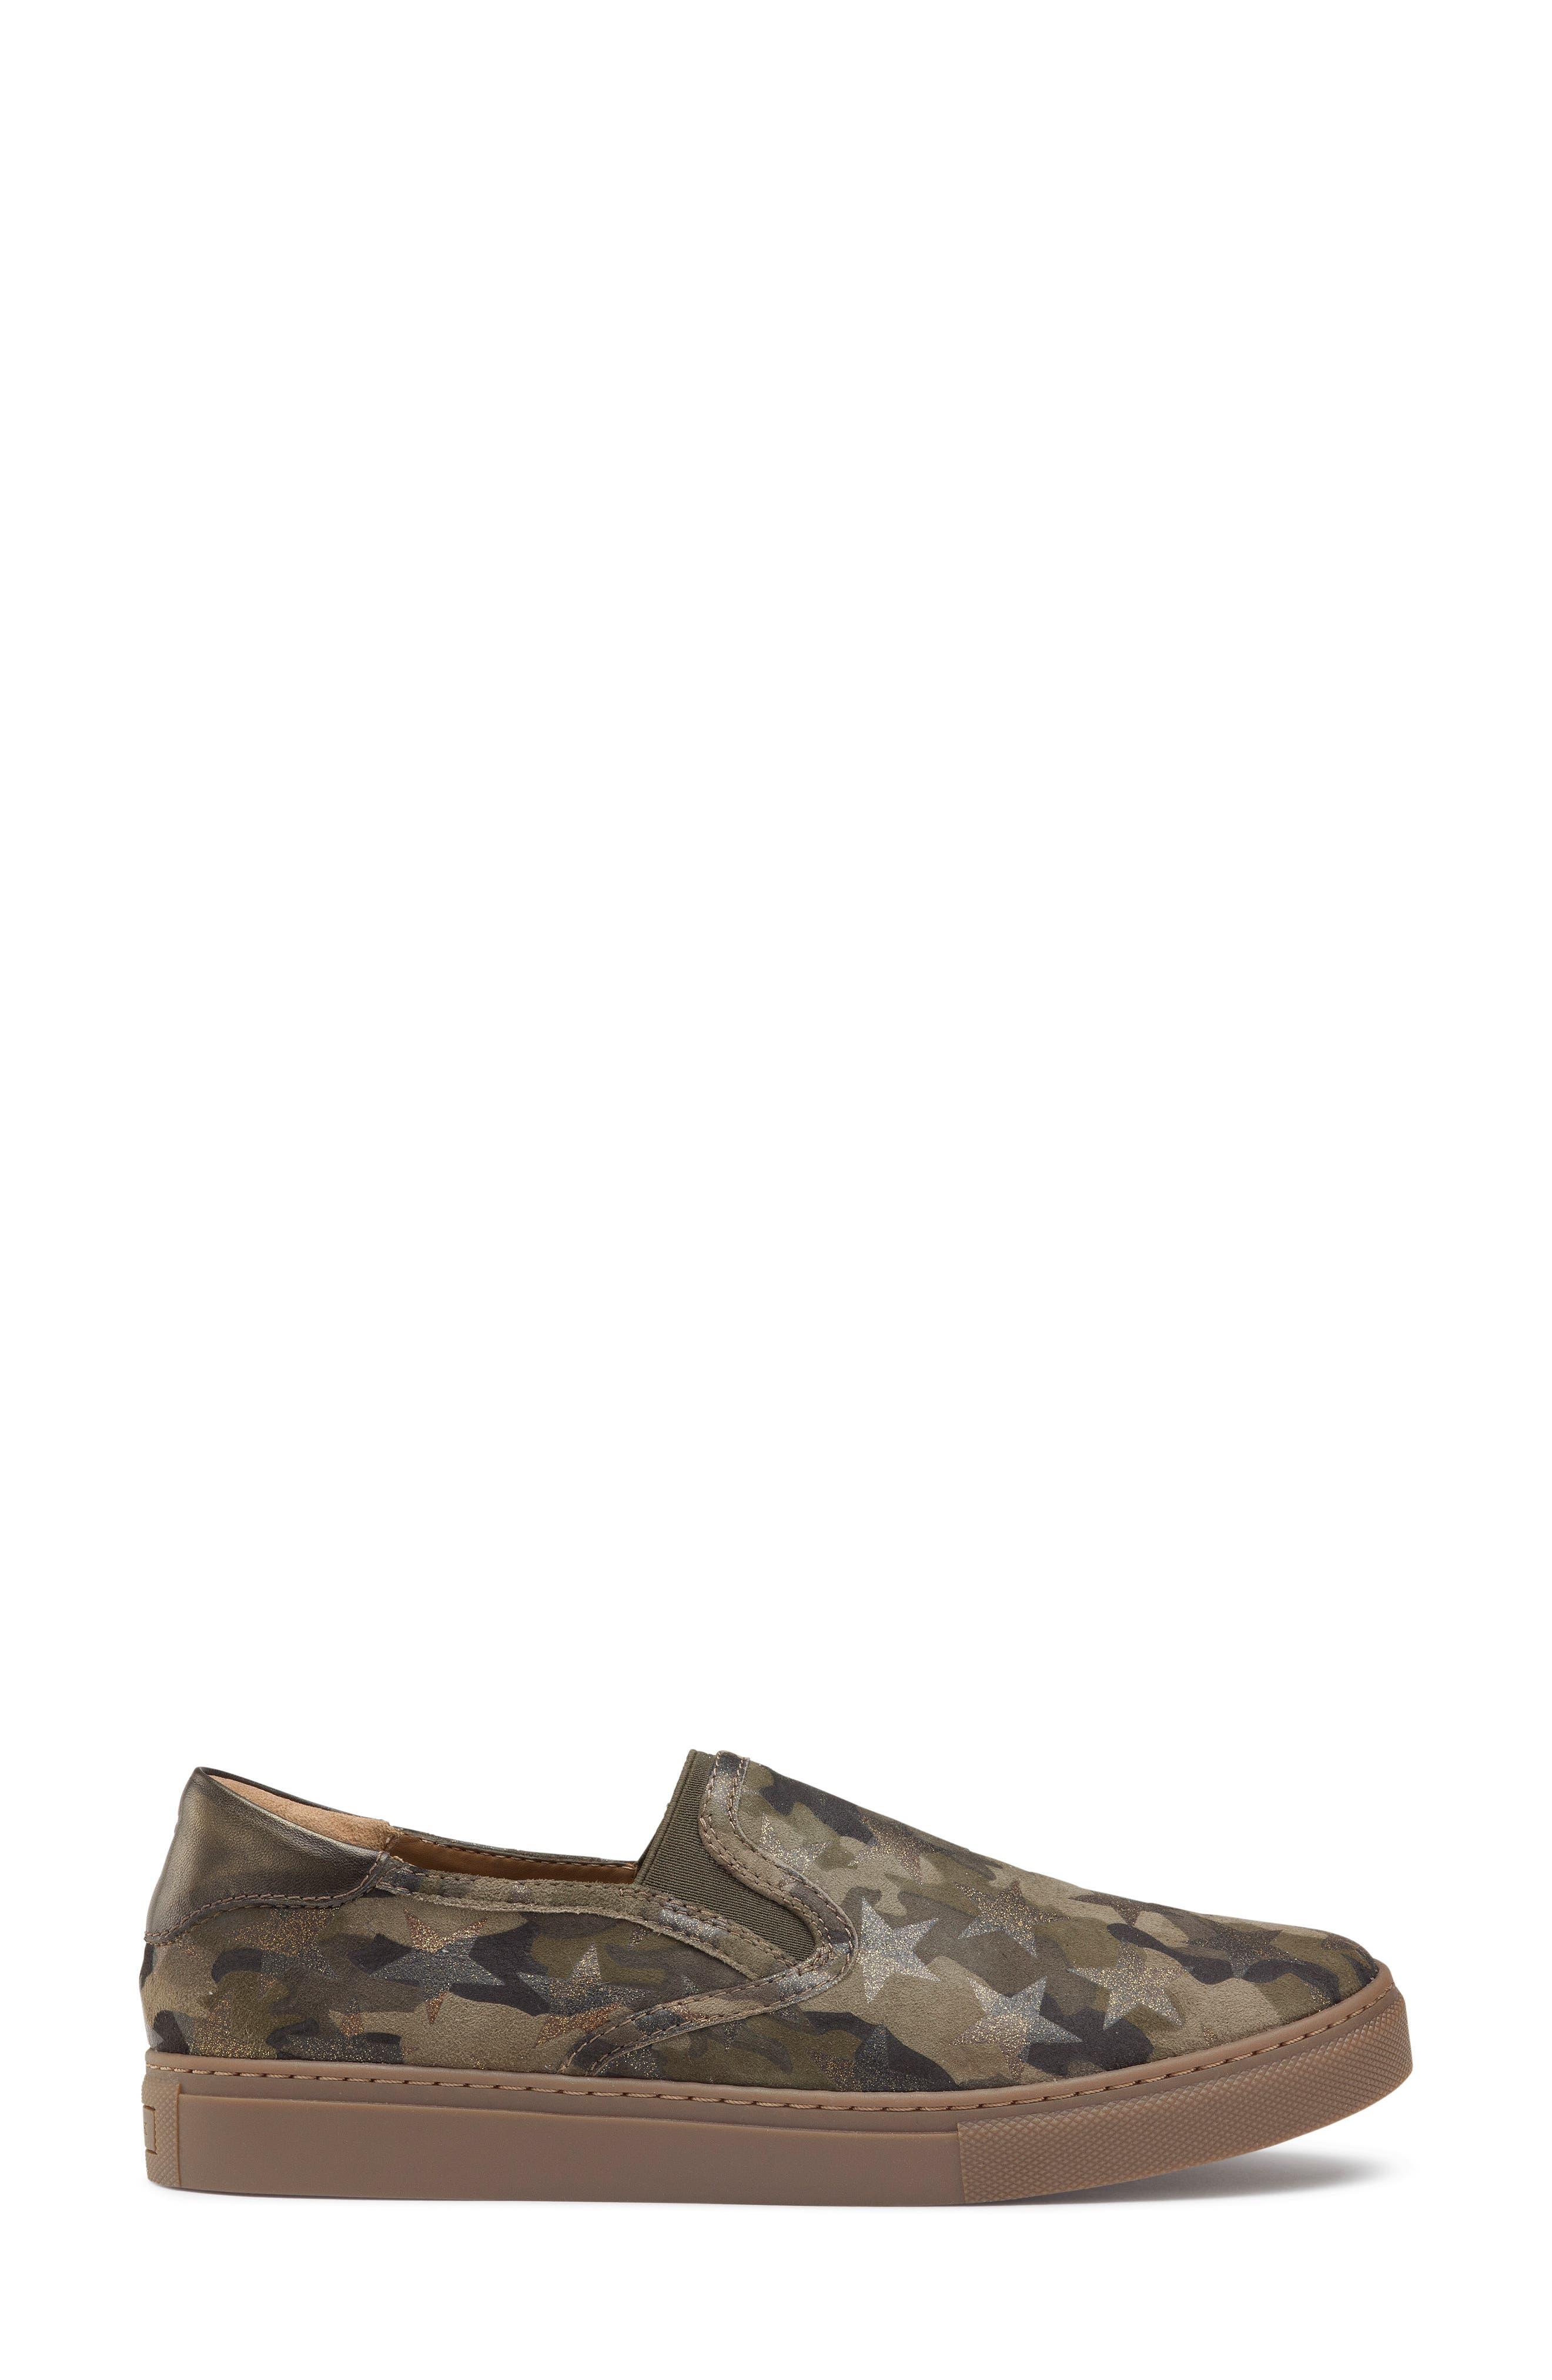 Lillian Water Resistant Slip-On Sneaker,                             Alternate thumbnail 3, color,                             OLIVE STAR PRINT SUEDE